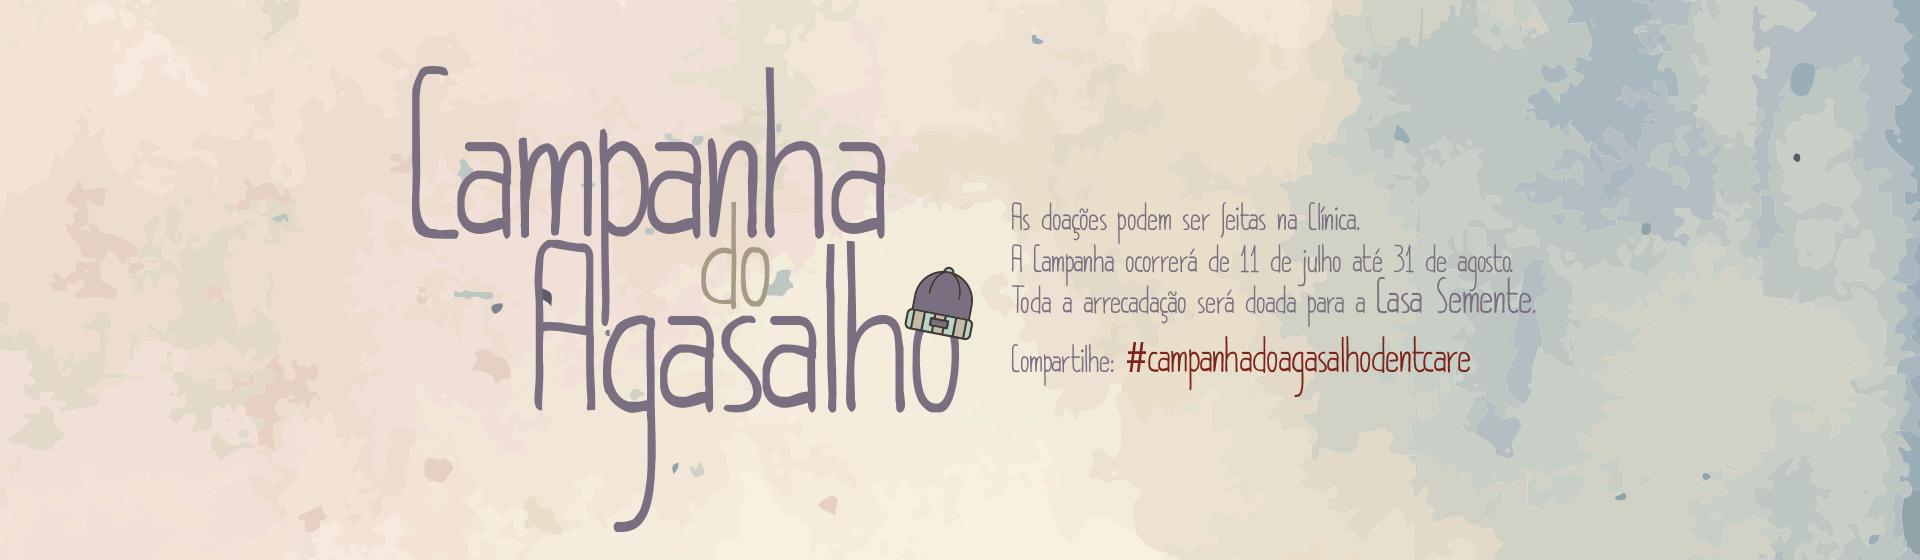 Campanha_Agasalho_Banner_Site